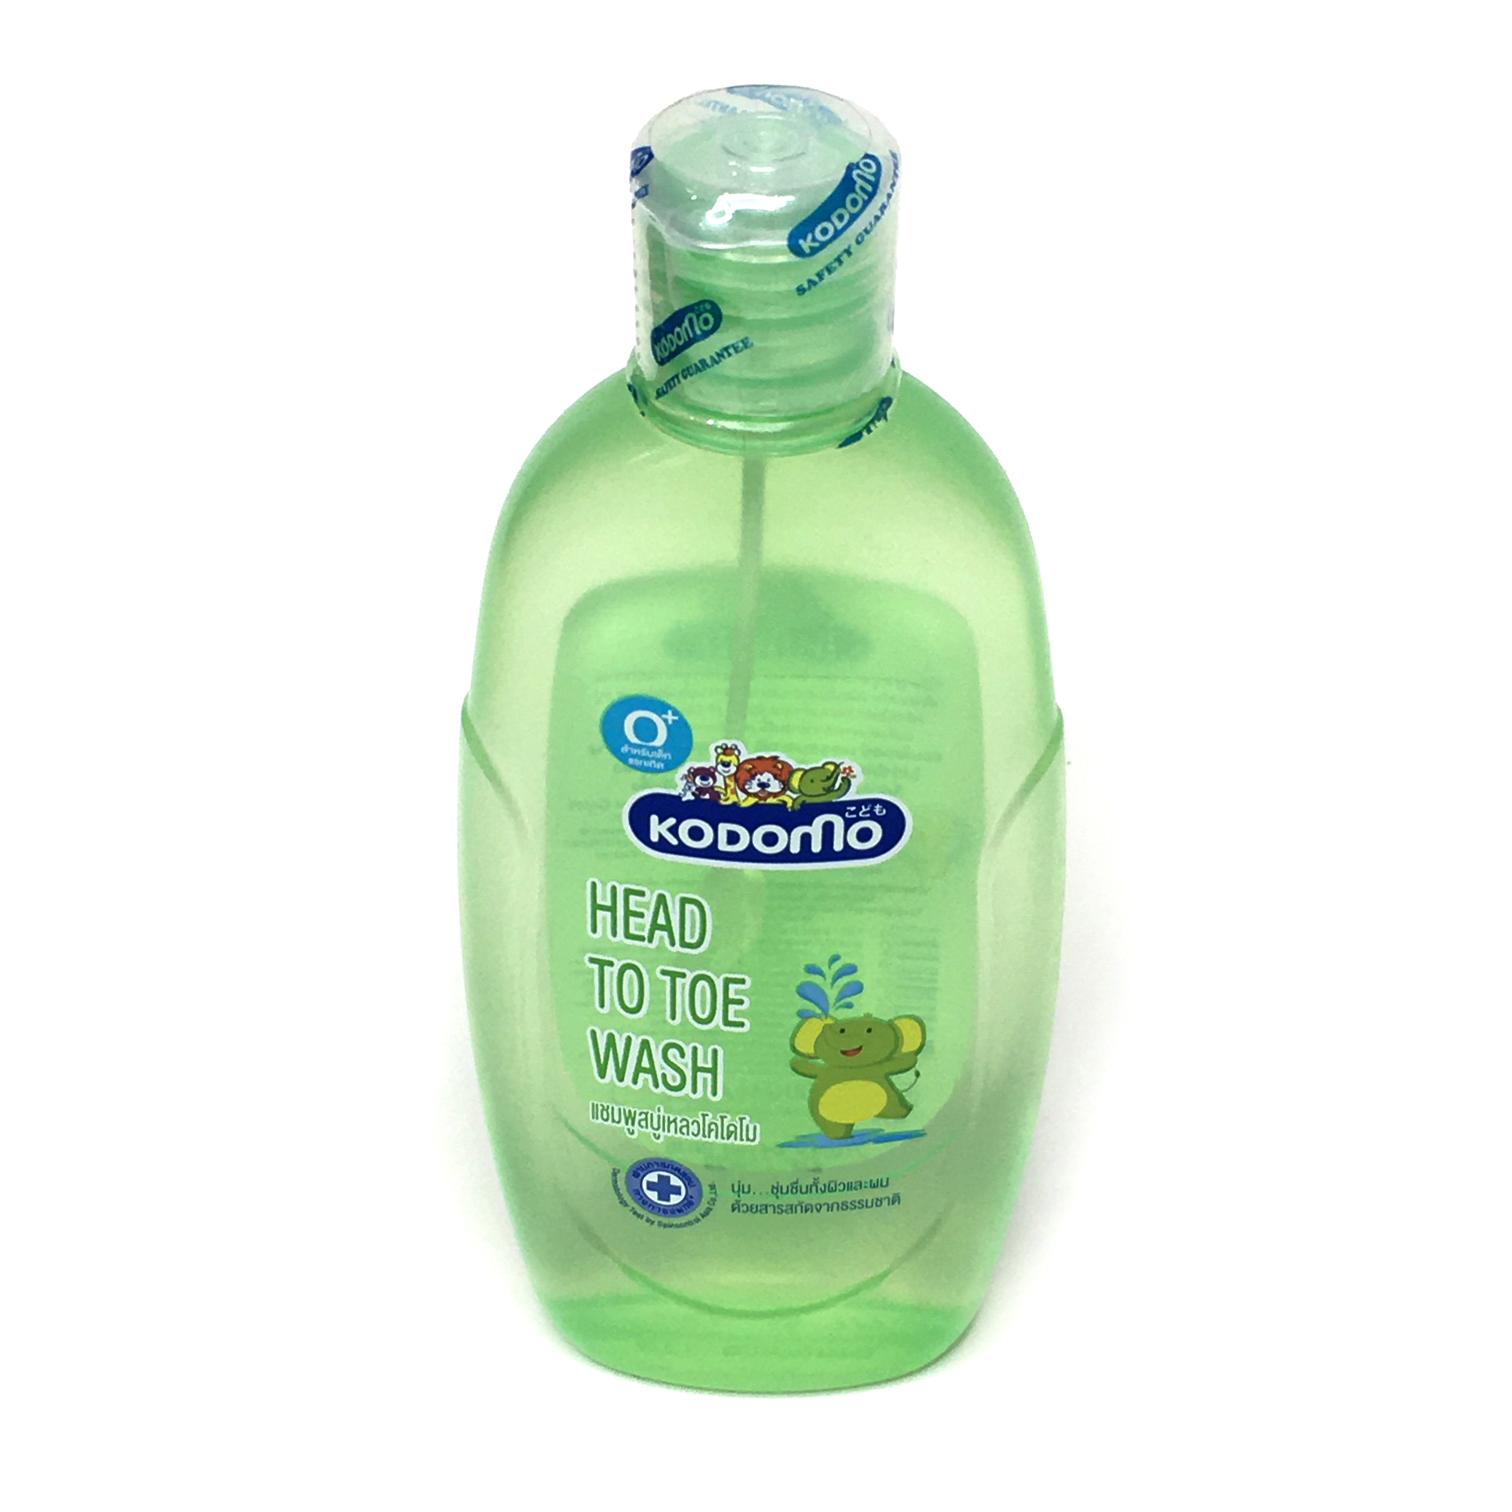 Kodomo Hair & Body wash(100ml)